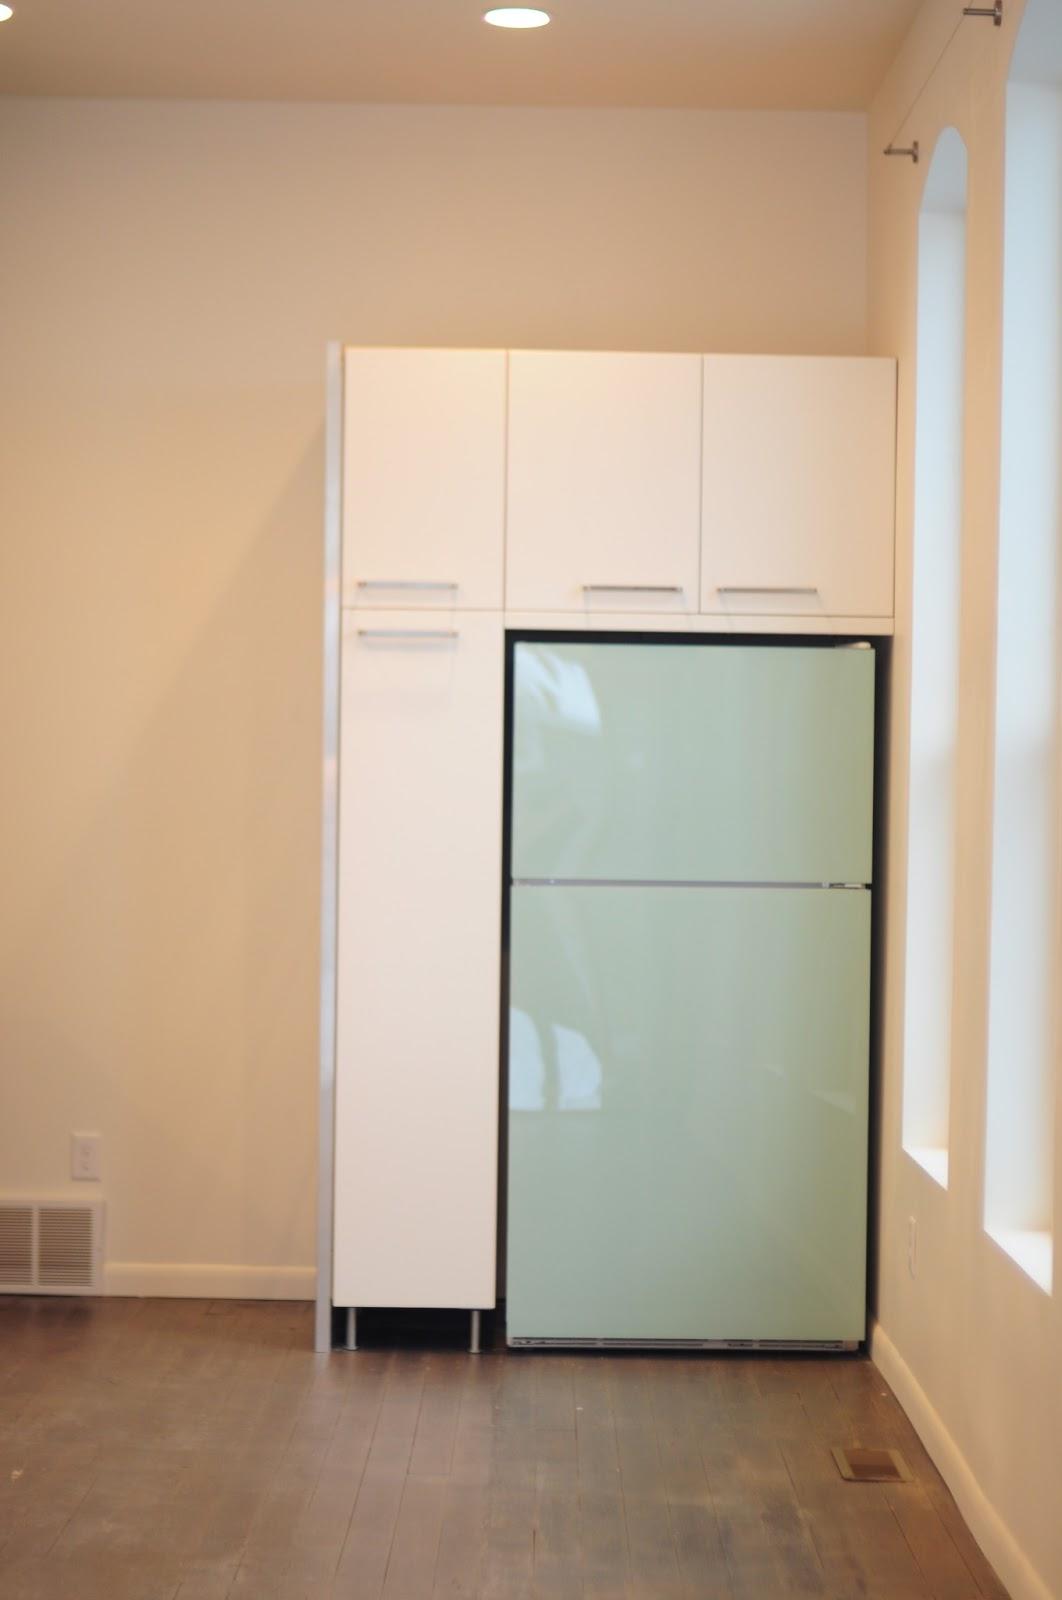 Diy Painted Plexiglass Refrigerator Panels Thread Ethic